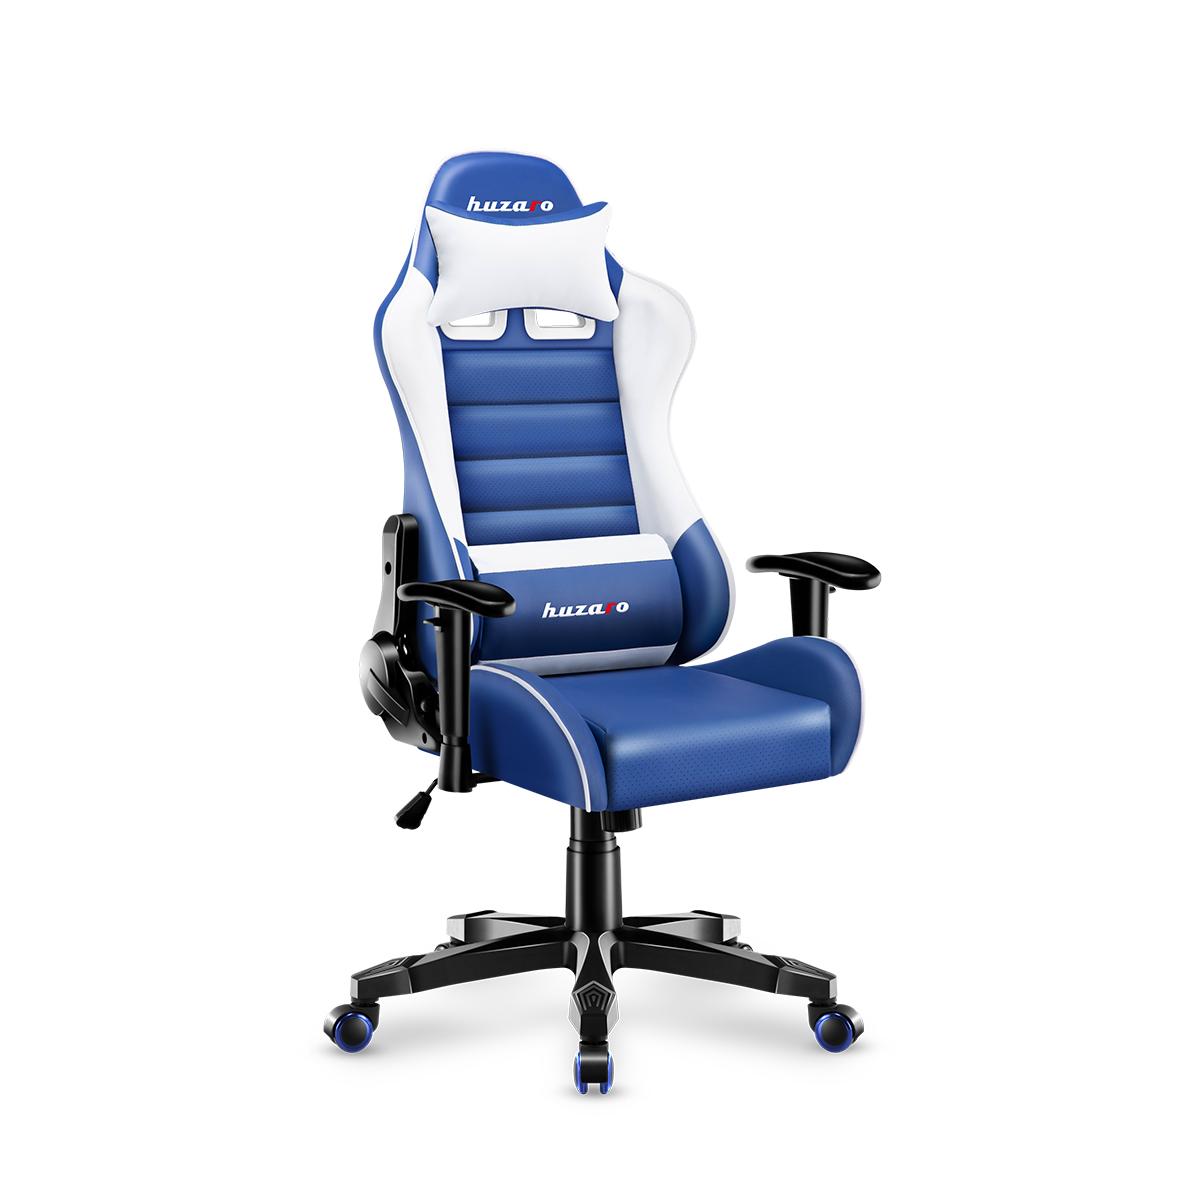 Prawy skos  fotela Ranger 6.0 Blue